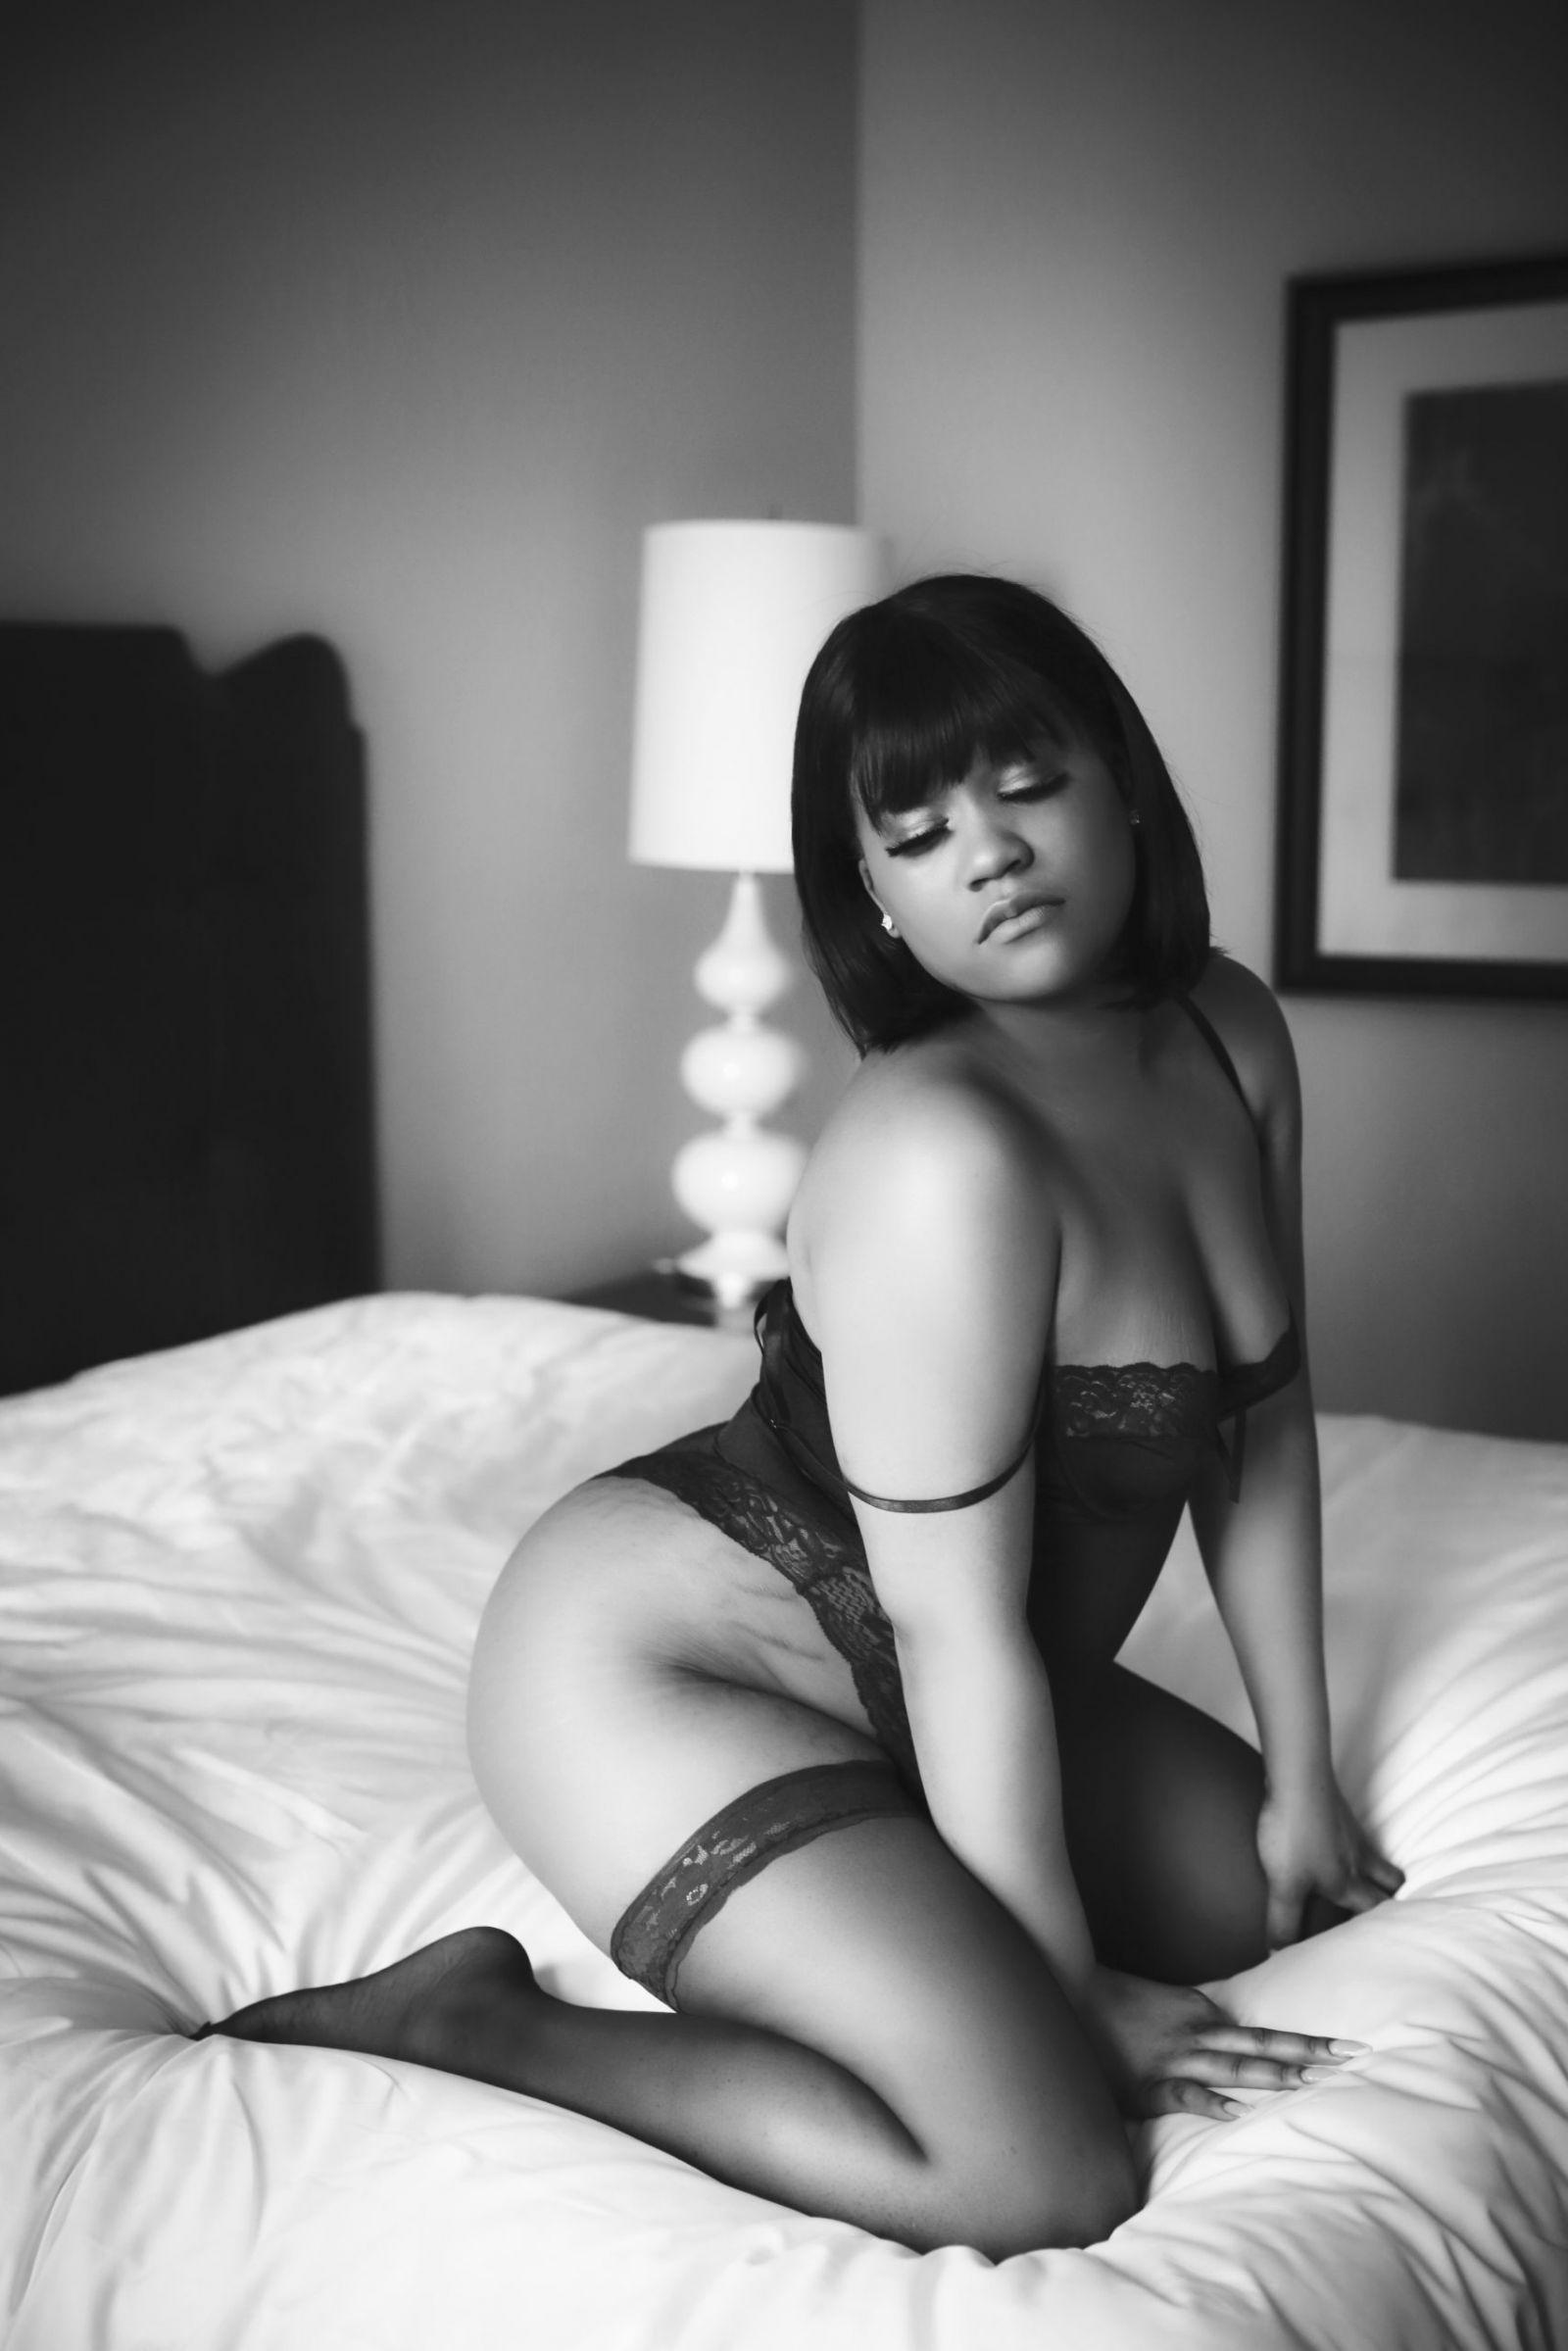 black and white boudoir image